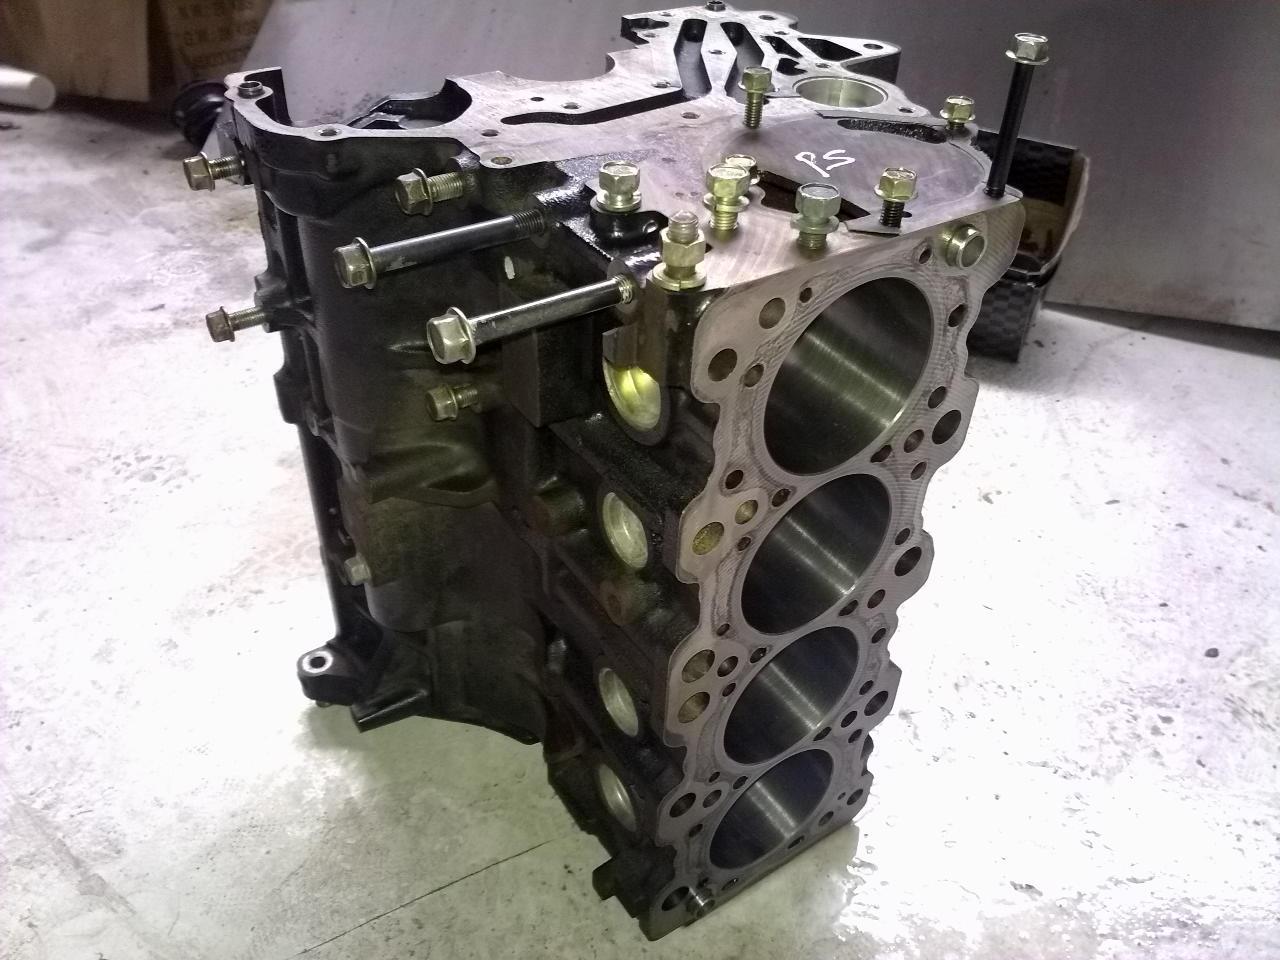 Mitsubishi Airtrek 2.0 turbo-4.bp.blogspot.com